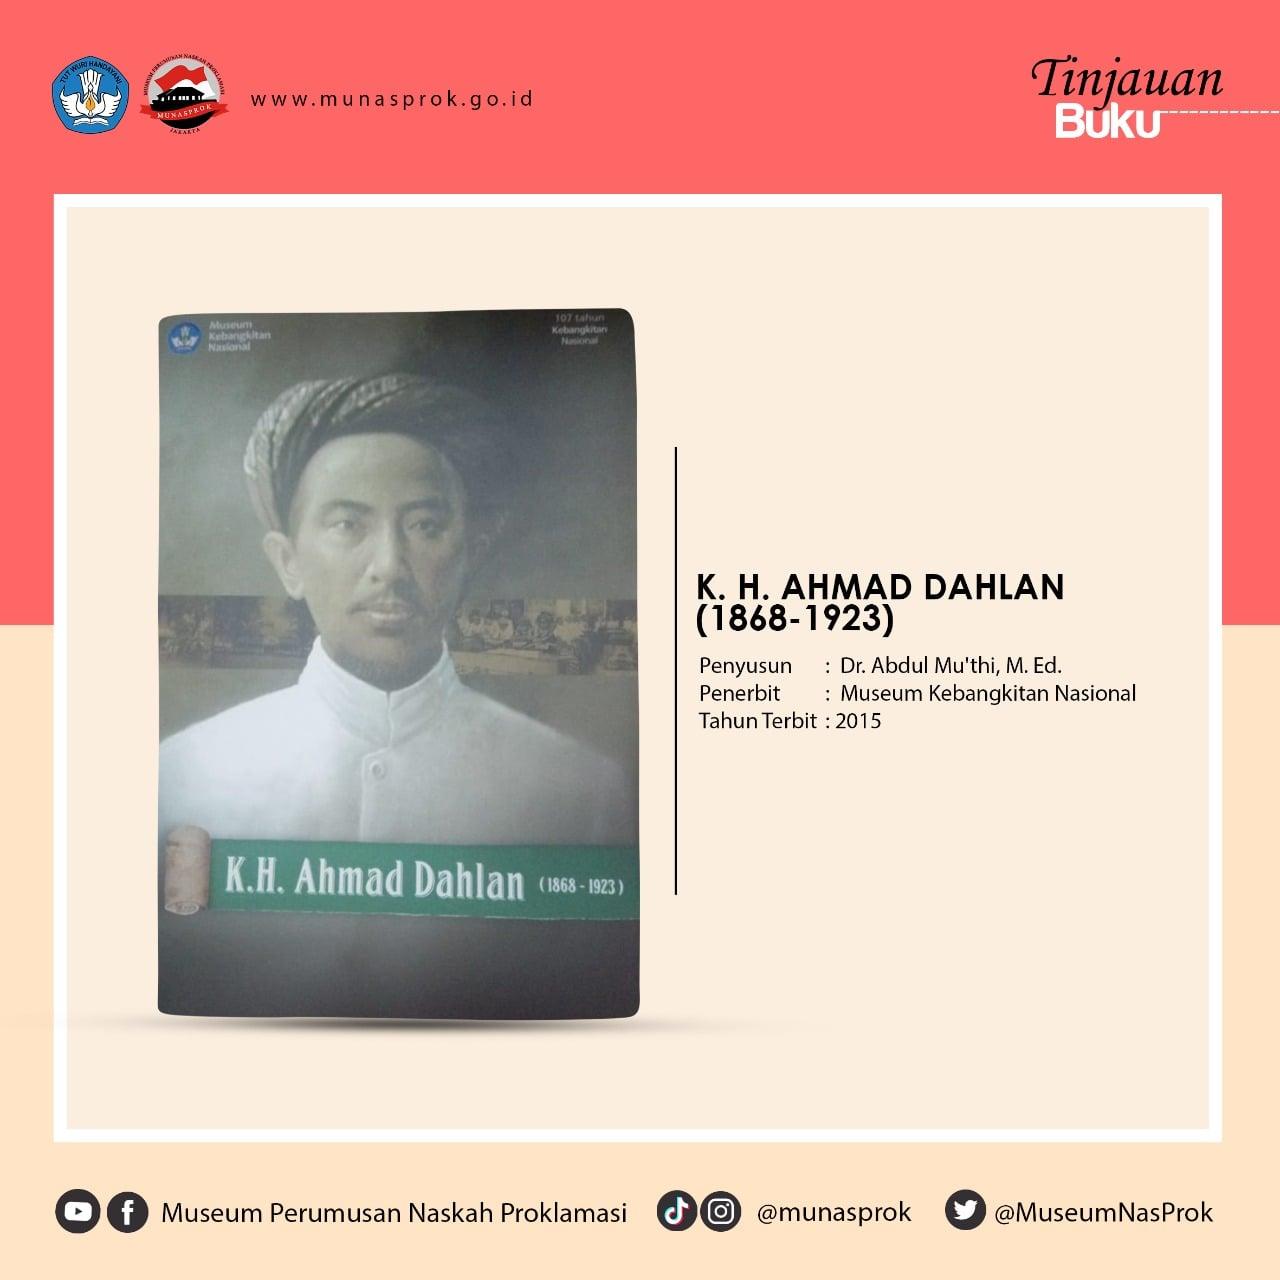 [TINJAUAN BUKU] – K. H. Ahmad Dahlan